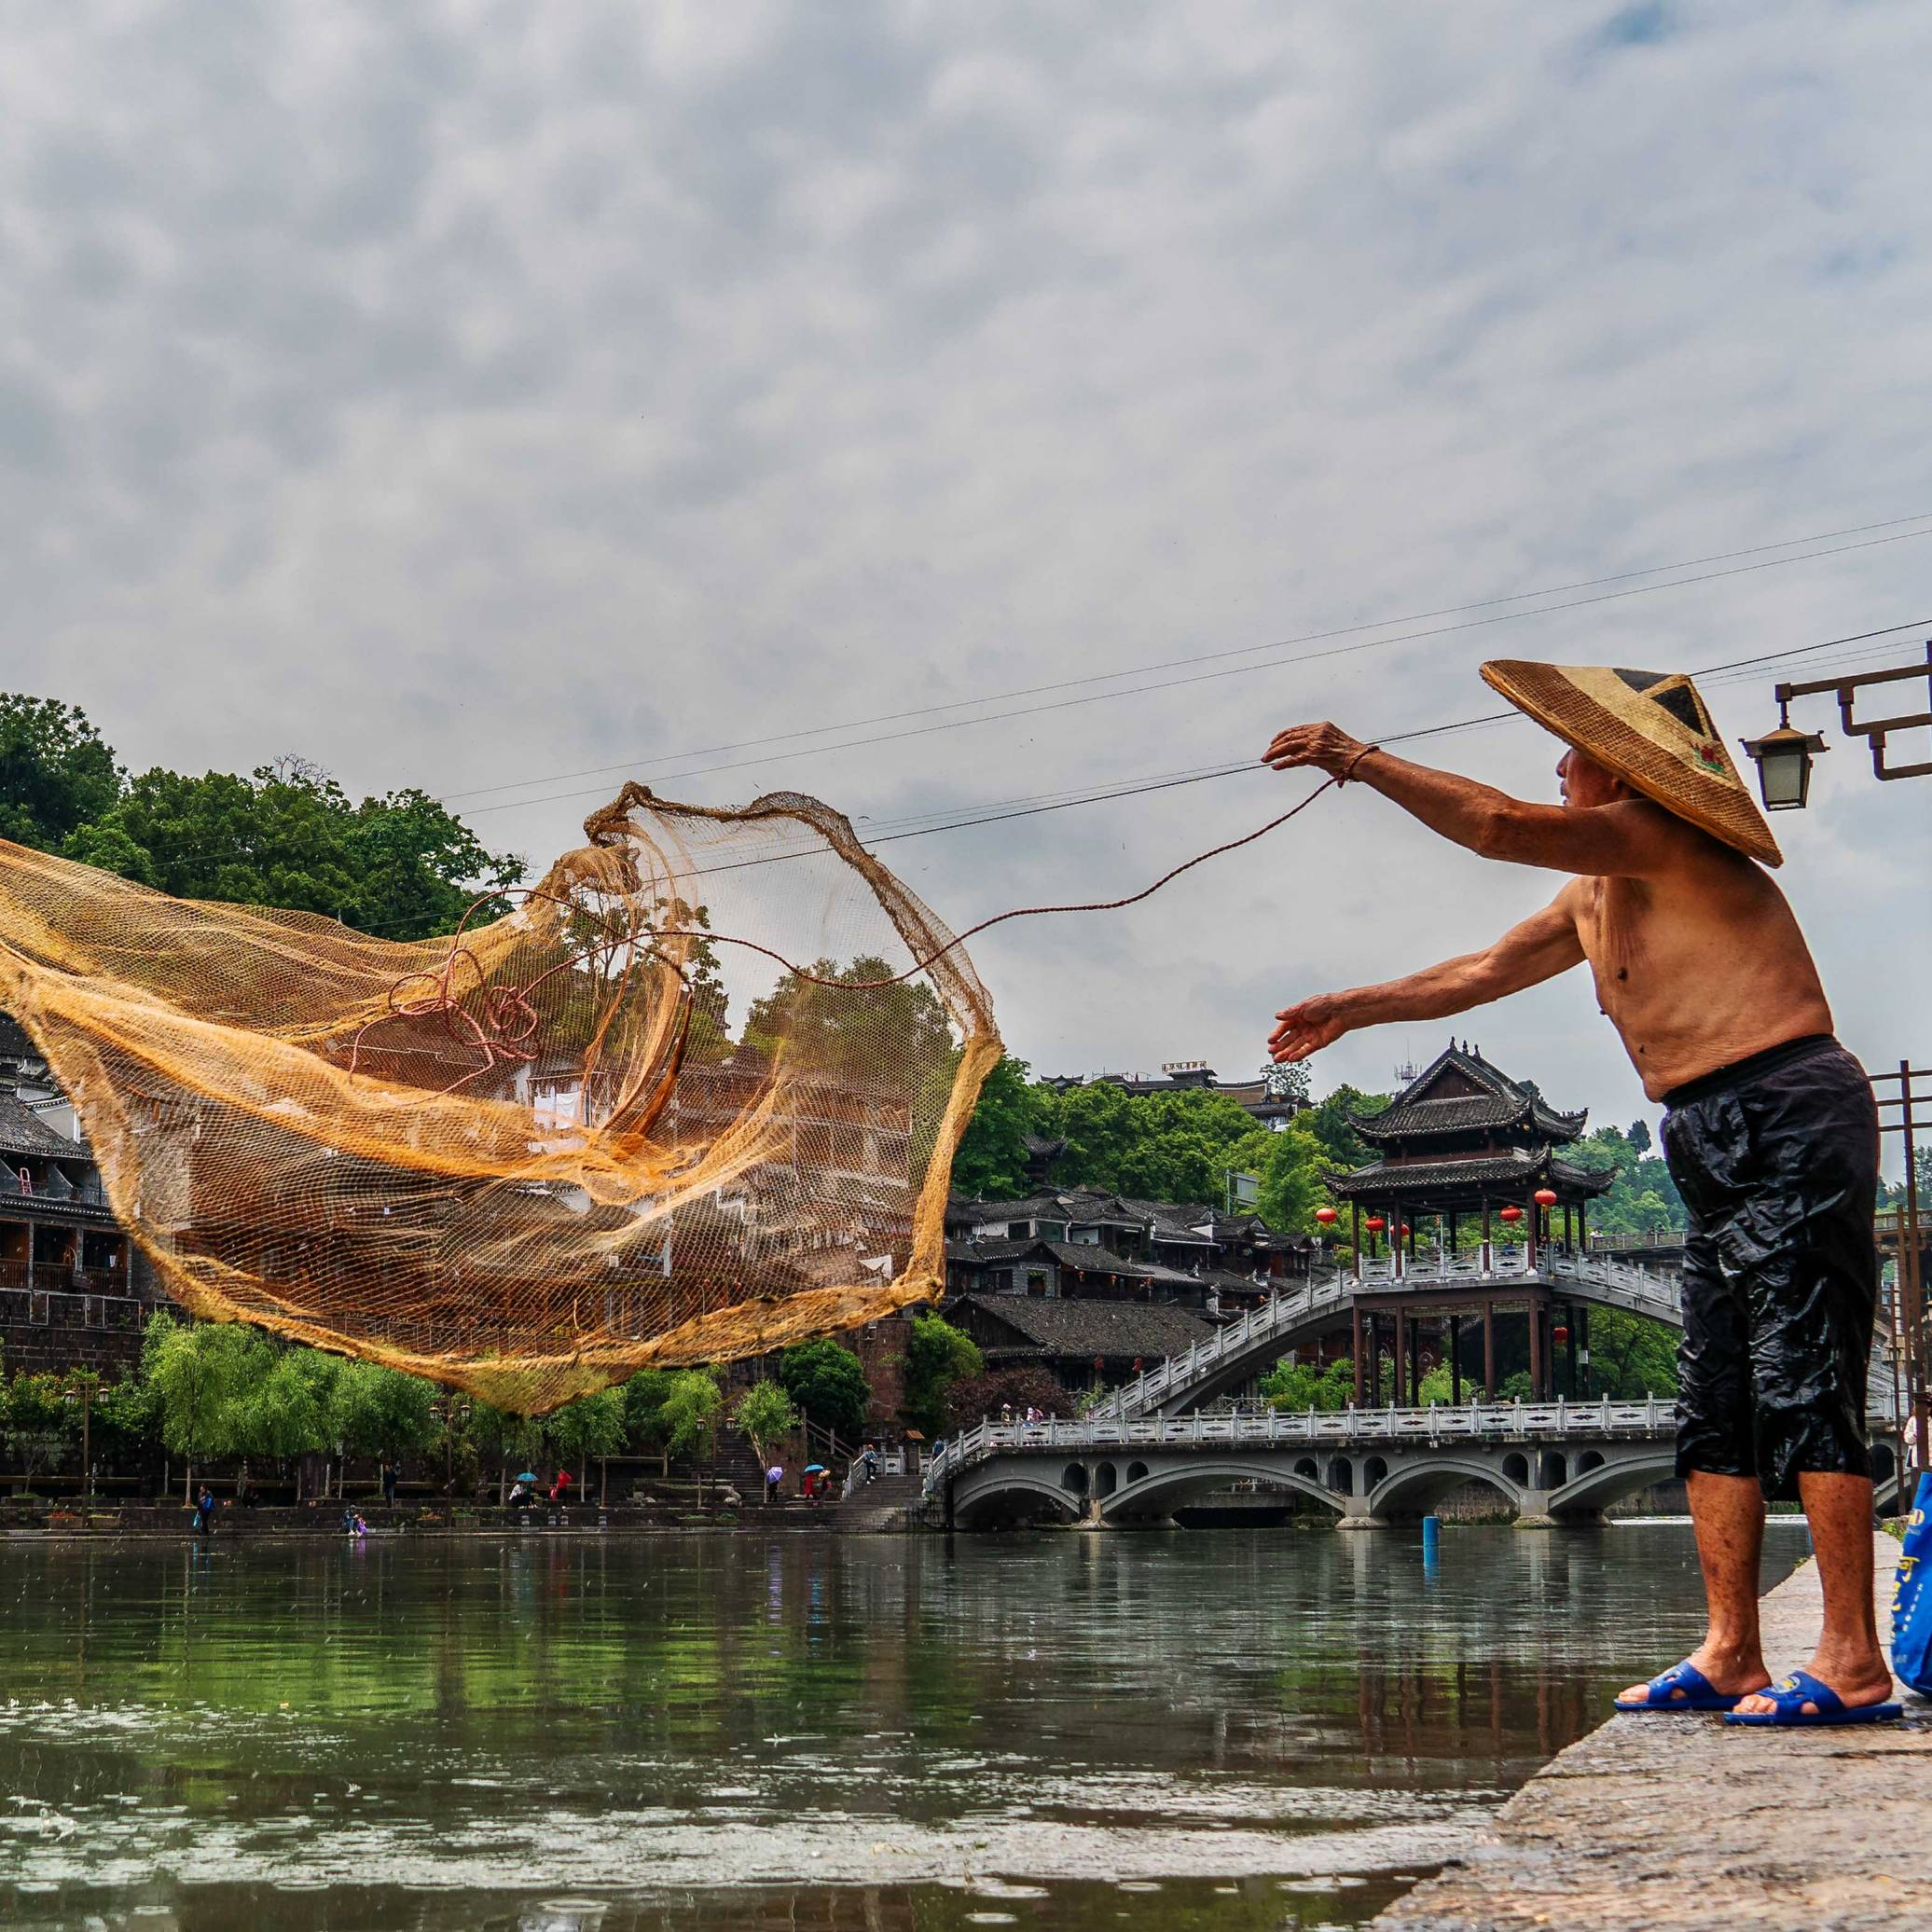 A Fishermen throwing his nets at Tuojiang River